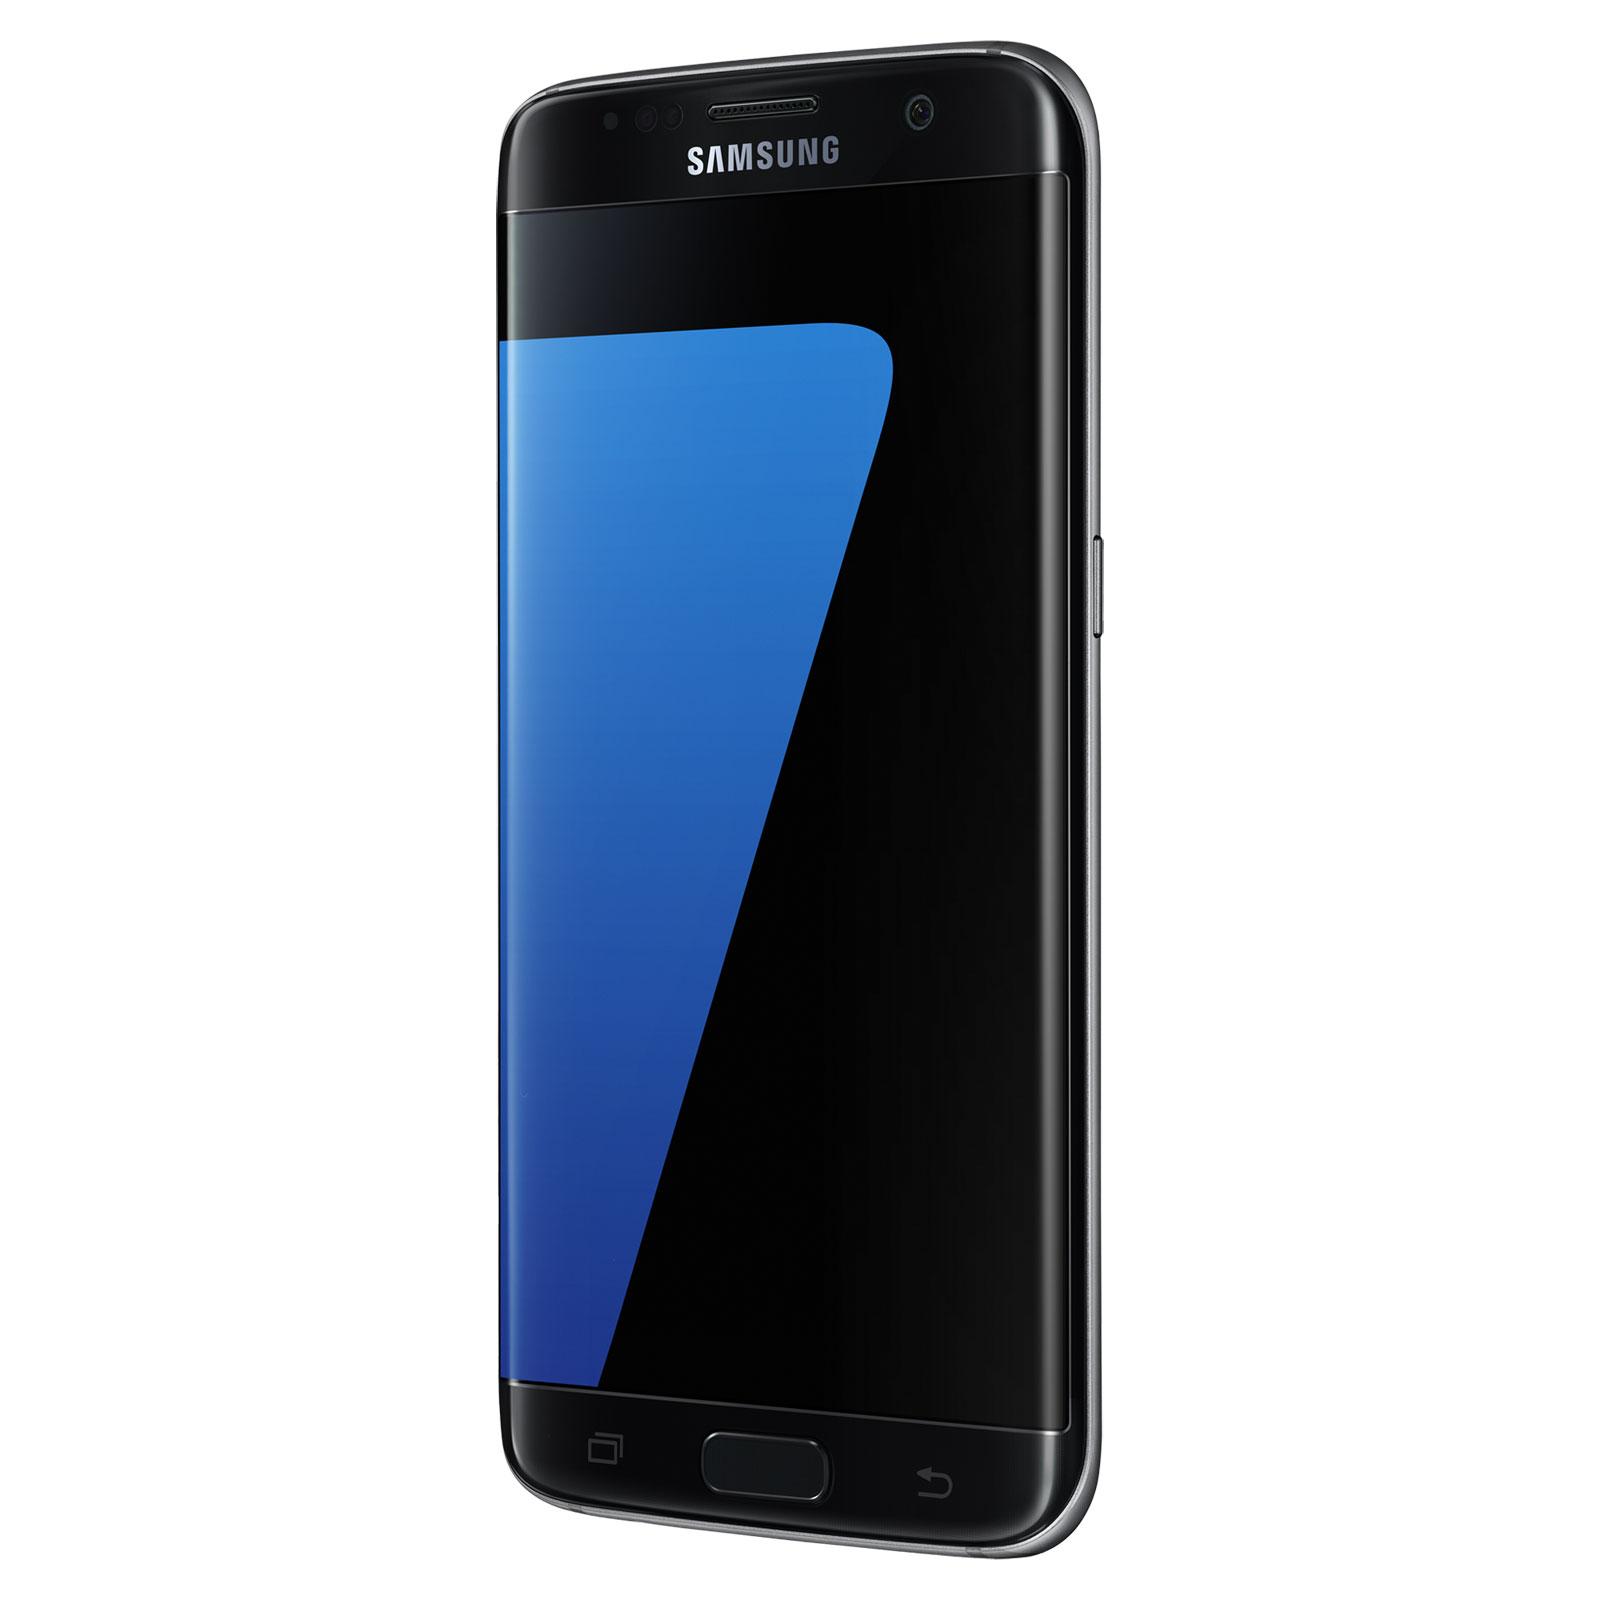 samsung galaxy s7 edge sm g935f noir 32 go mobile smartphone samsung sur. Black Bedroom Furniture Sets. Home Design Ideas